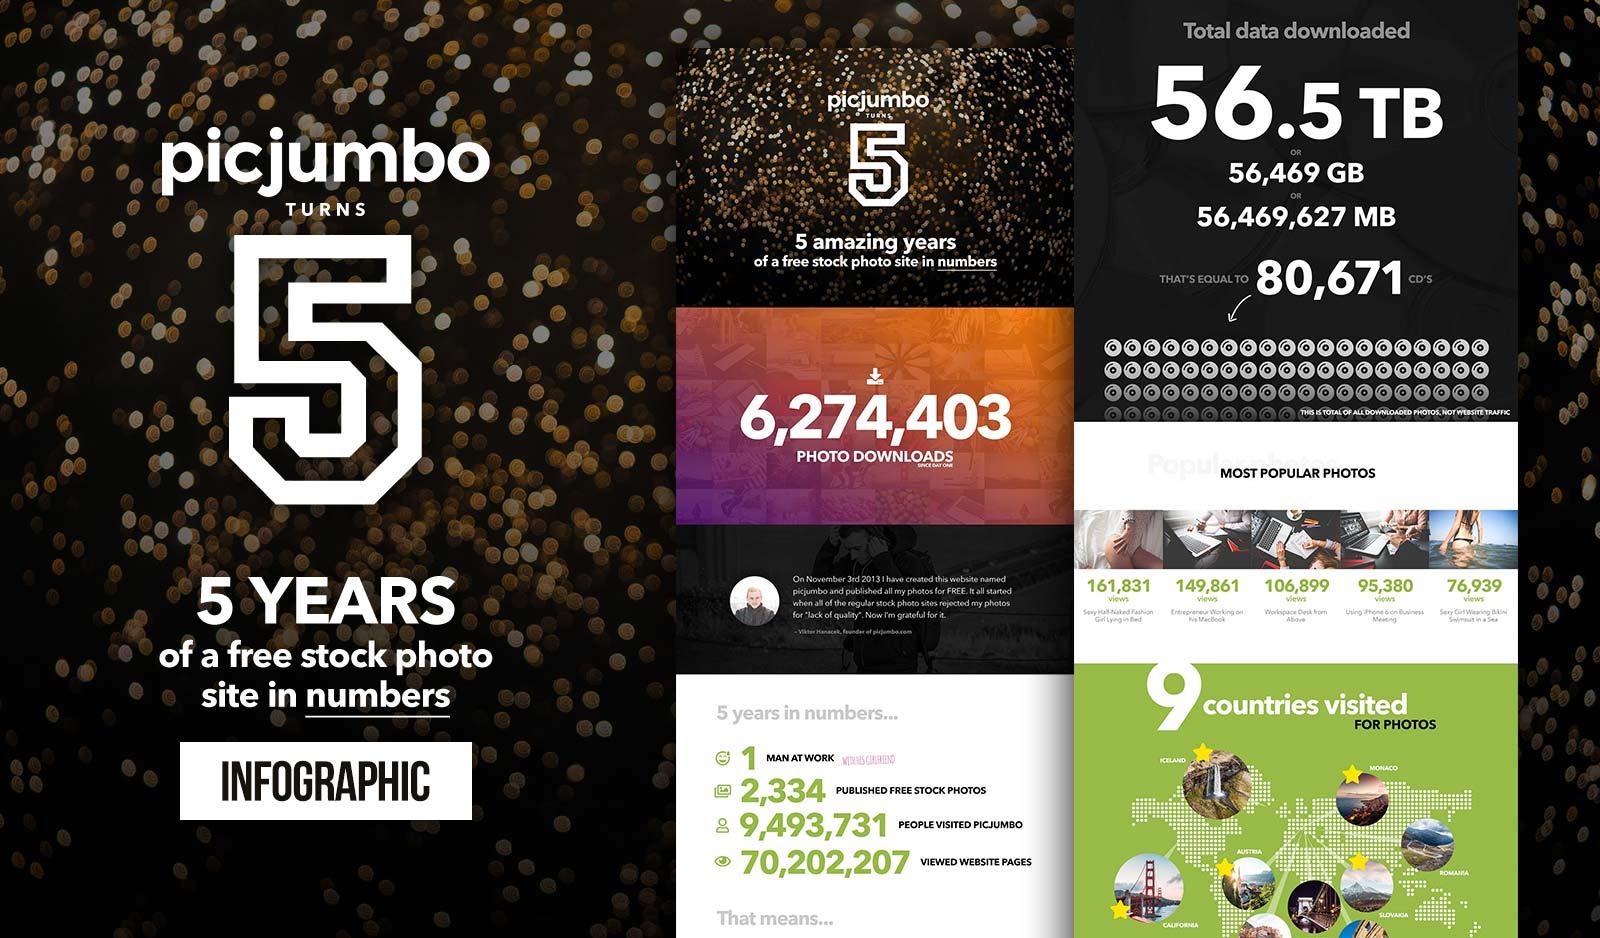 picjumbo BLOG: Infographic: 5 Amazing Years of picjumbo in Numbers